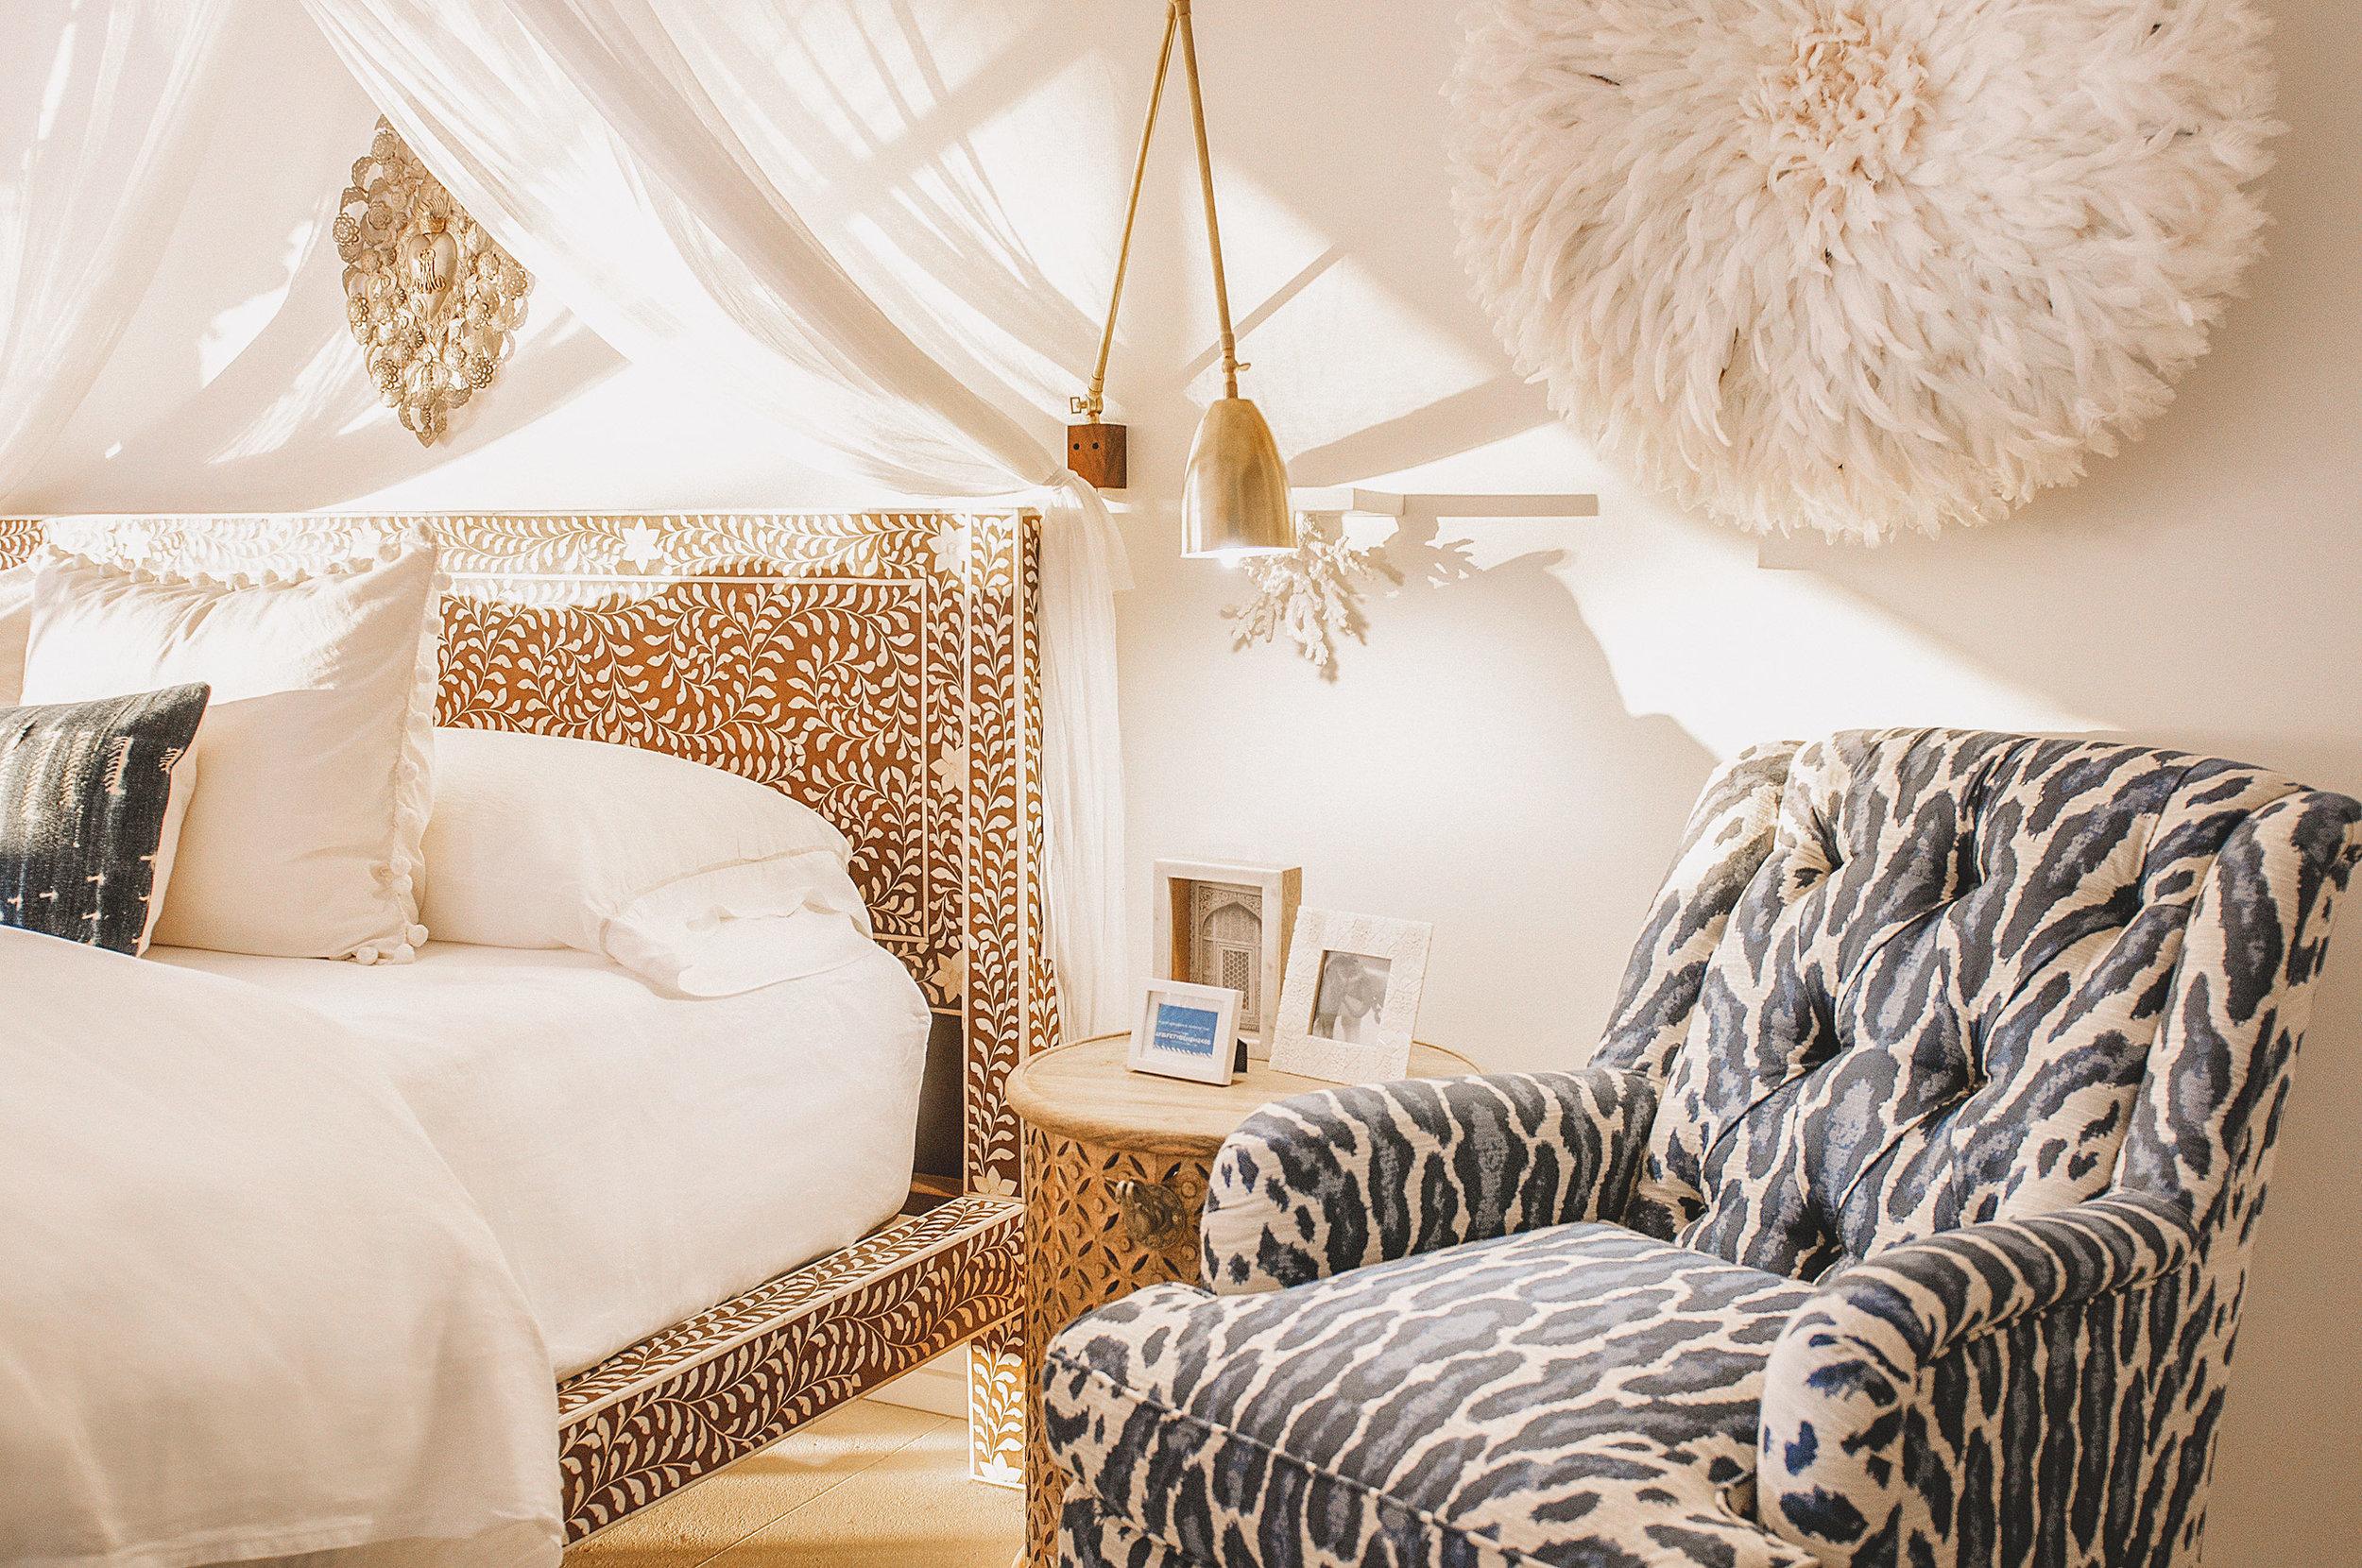 Barellen-7-Bedroom-1a-4-Master-DSC_6579.jpg